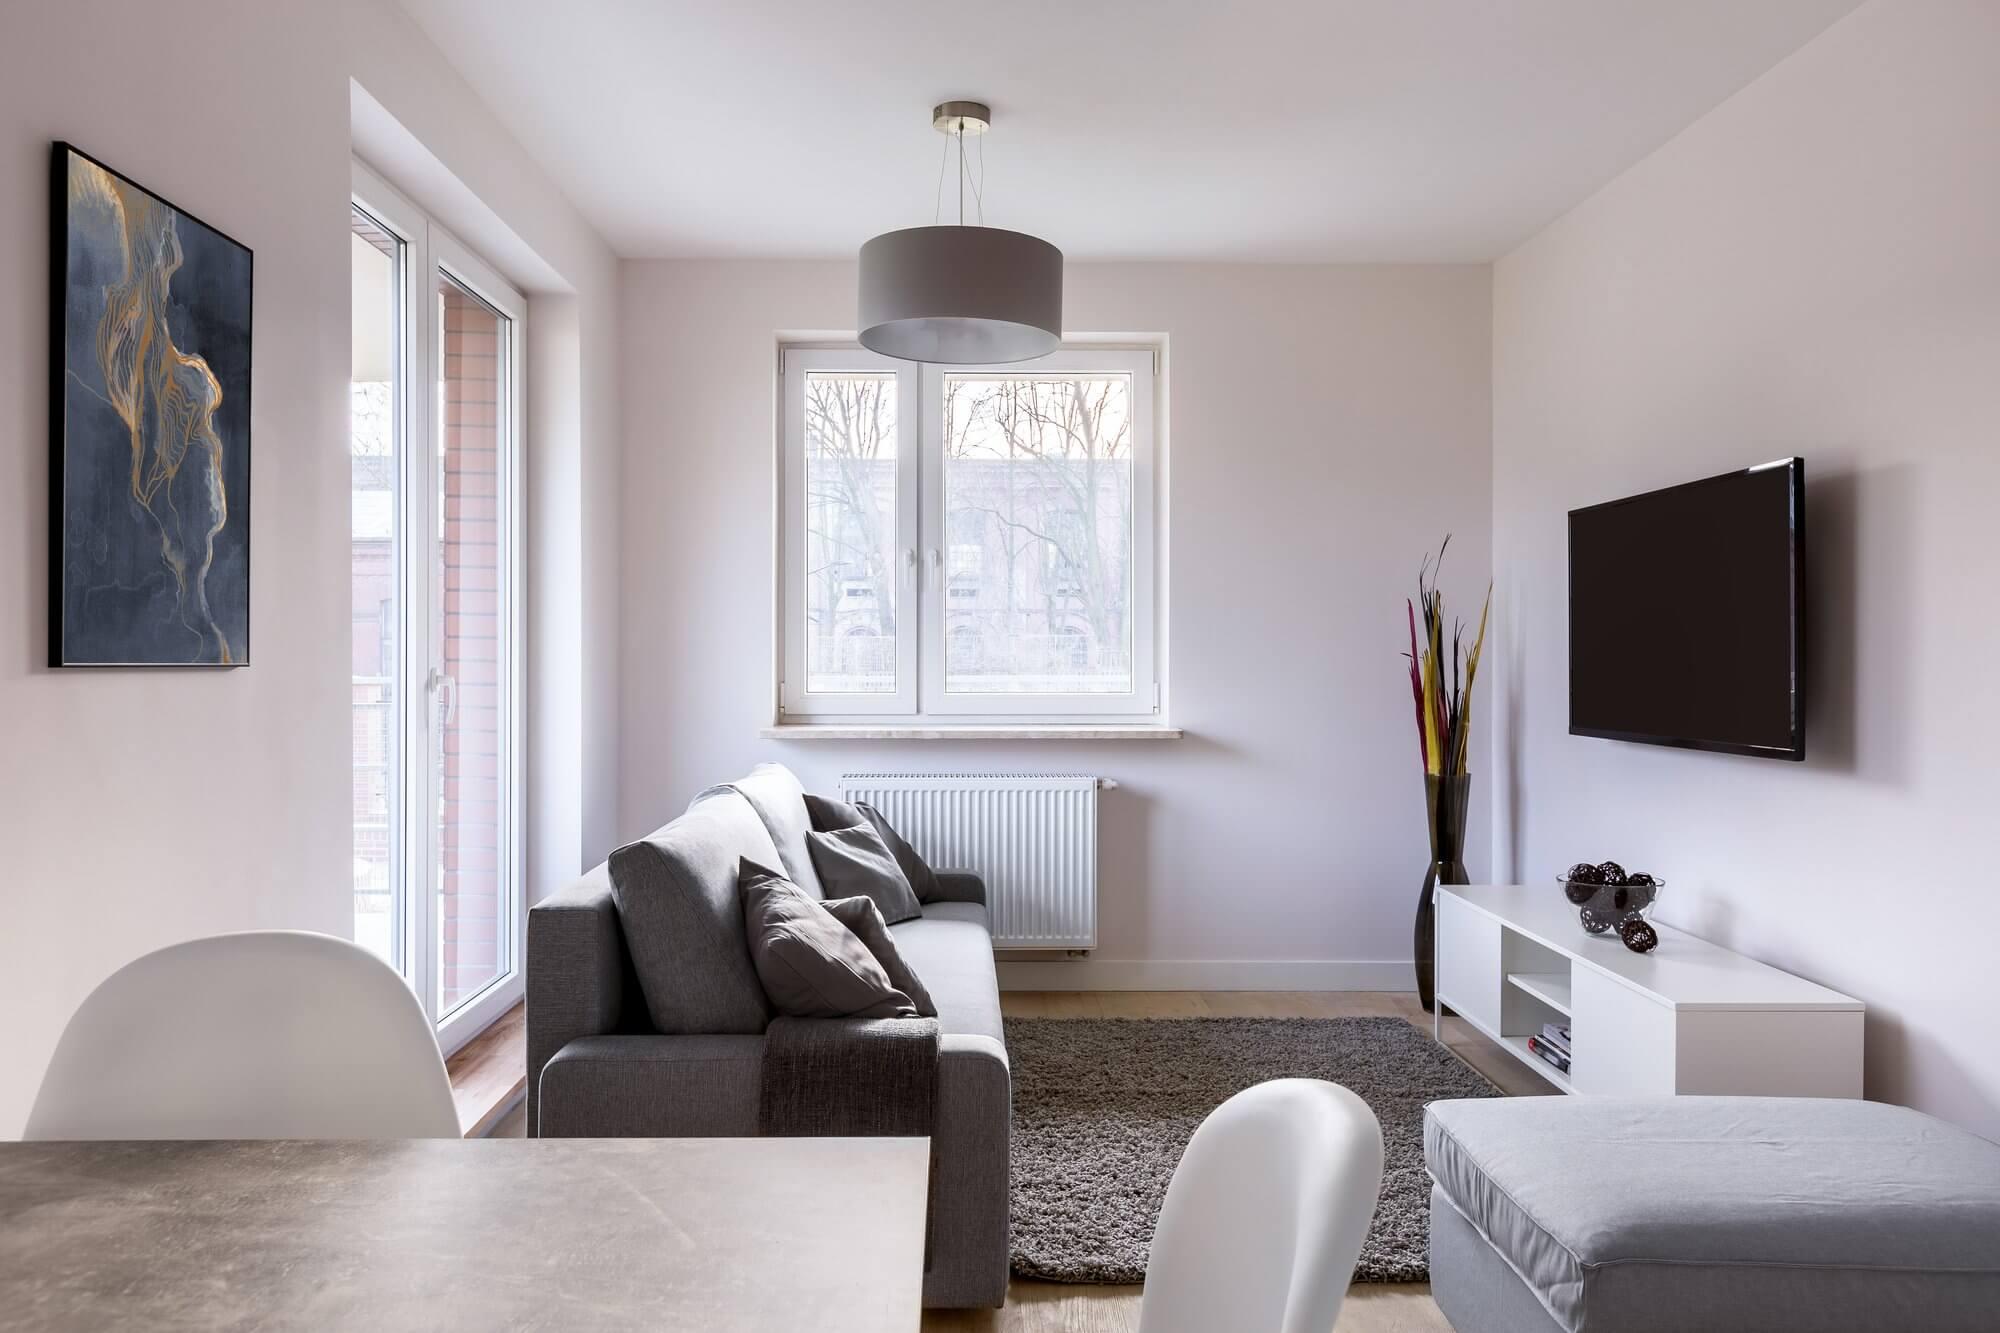 Minimal Decor for Living Room